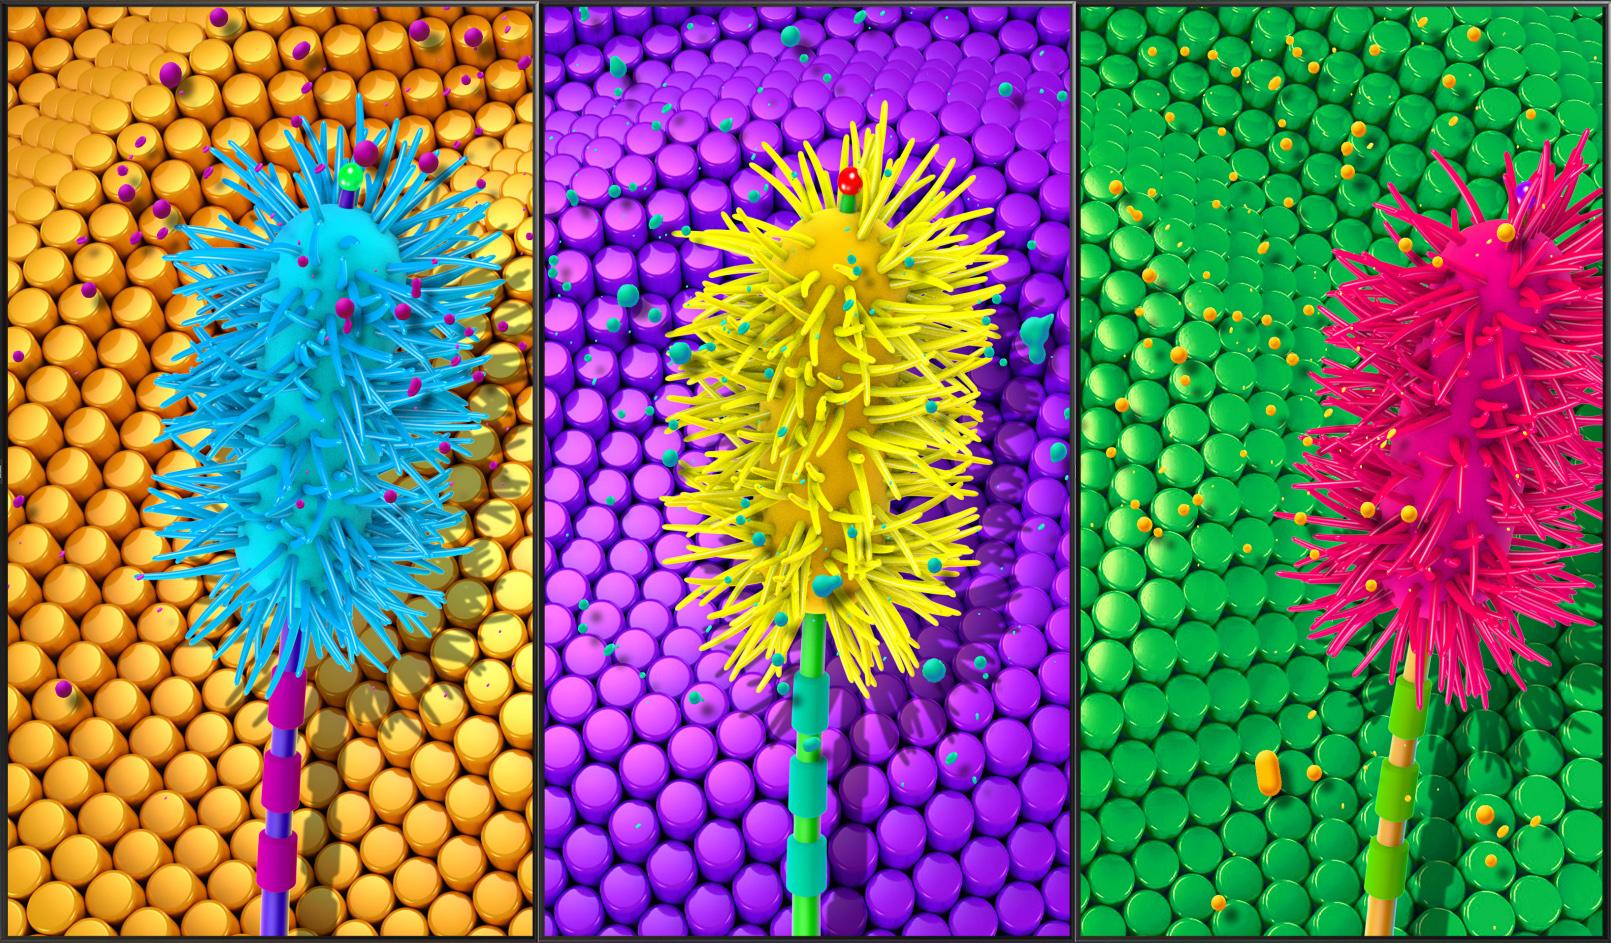 blossom_0010_Blossom - Sample Image - 31.jpg